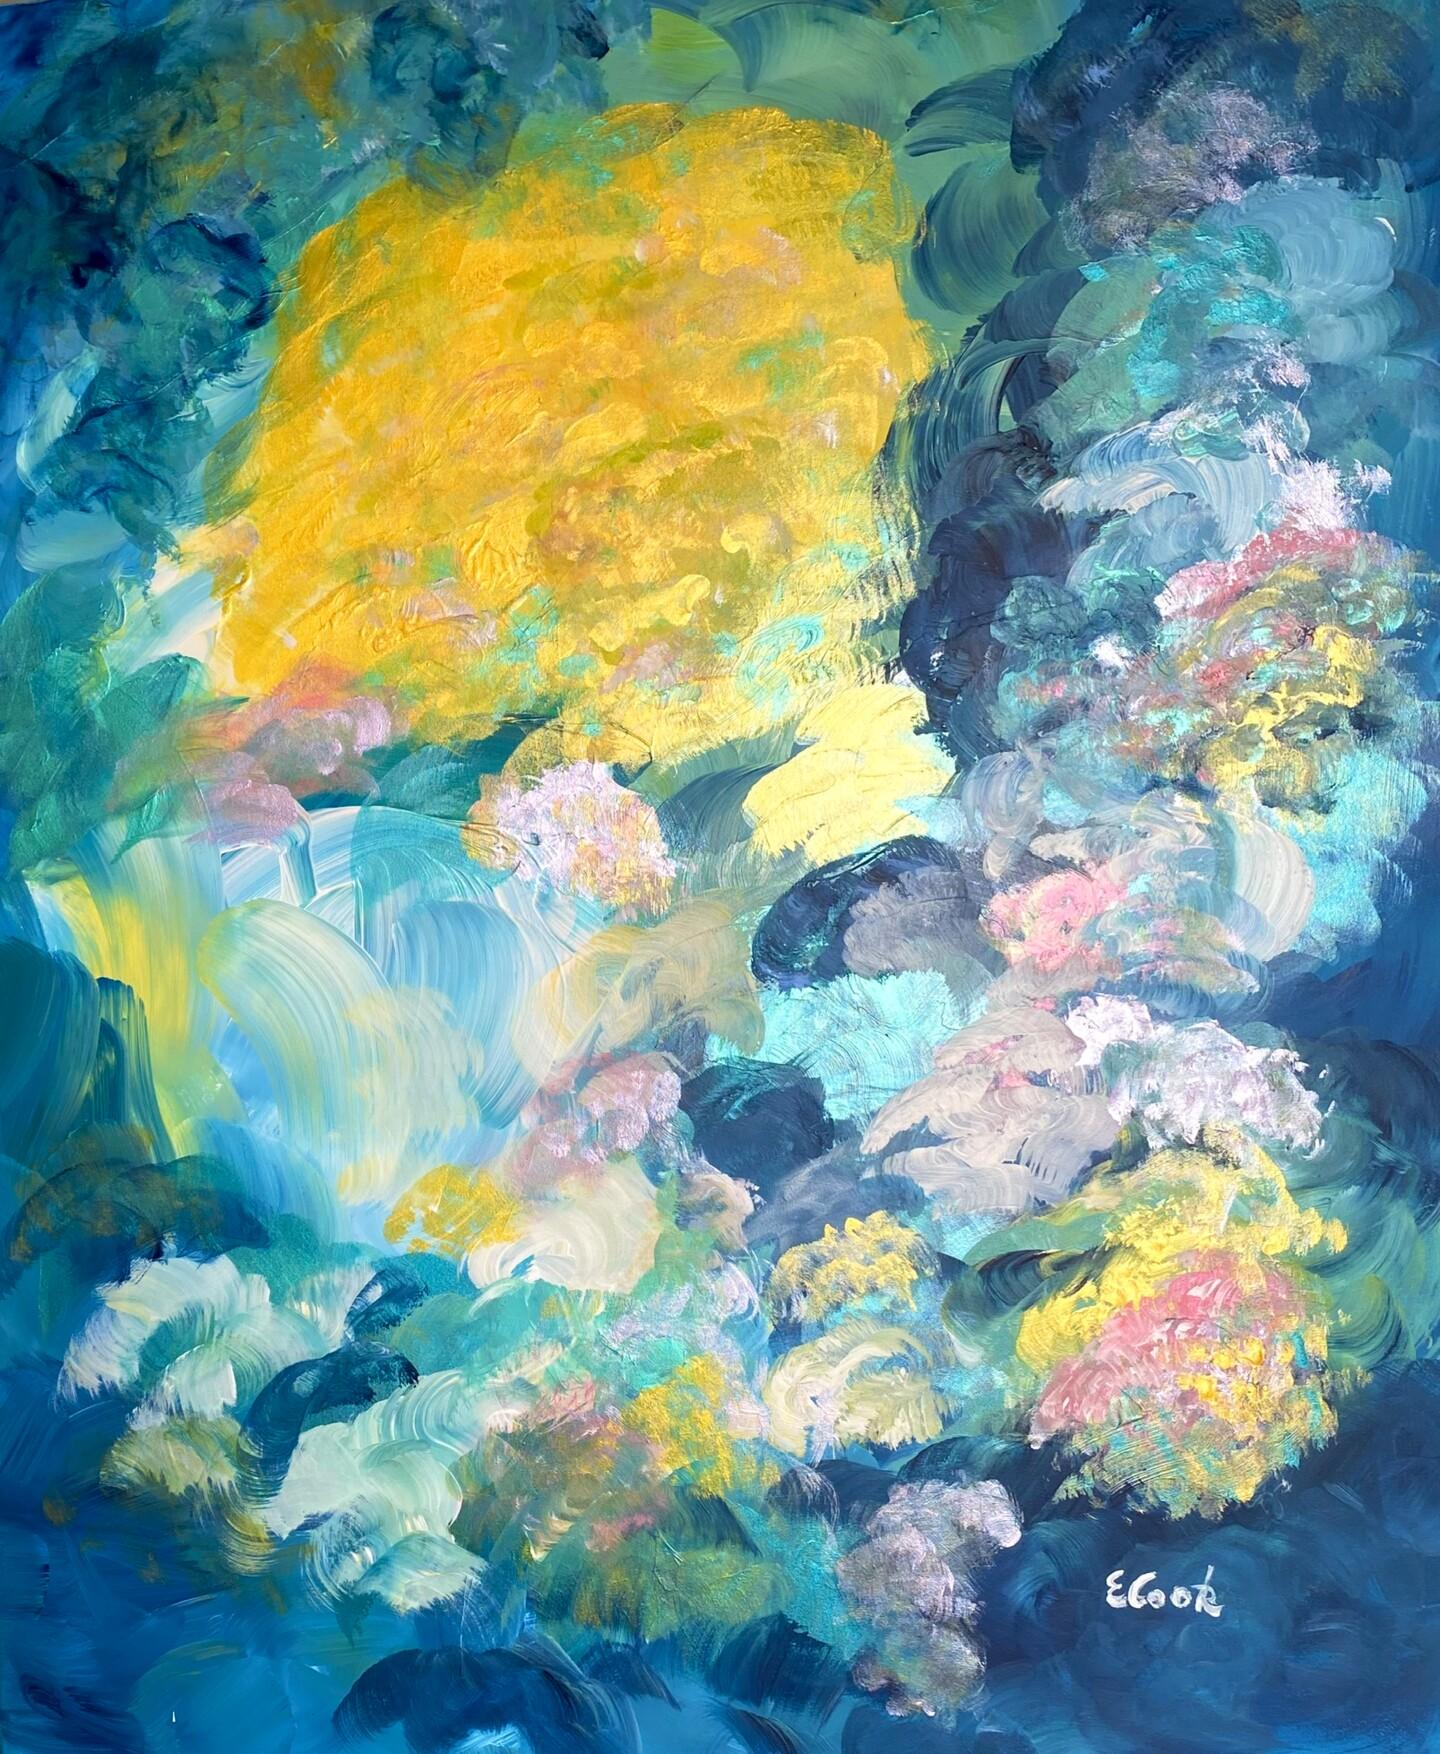 Elisa Cook - Shimmering Flowers